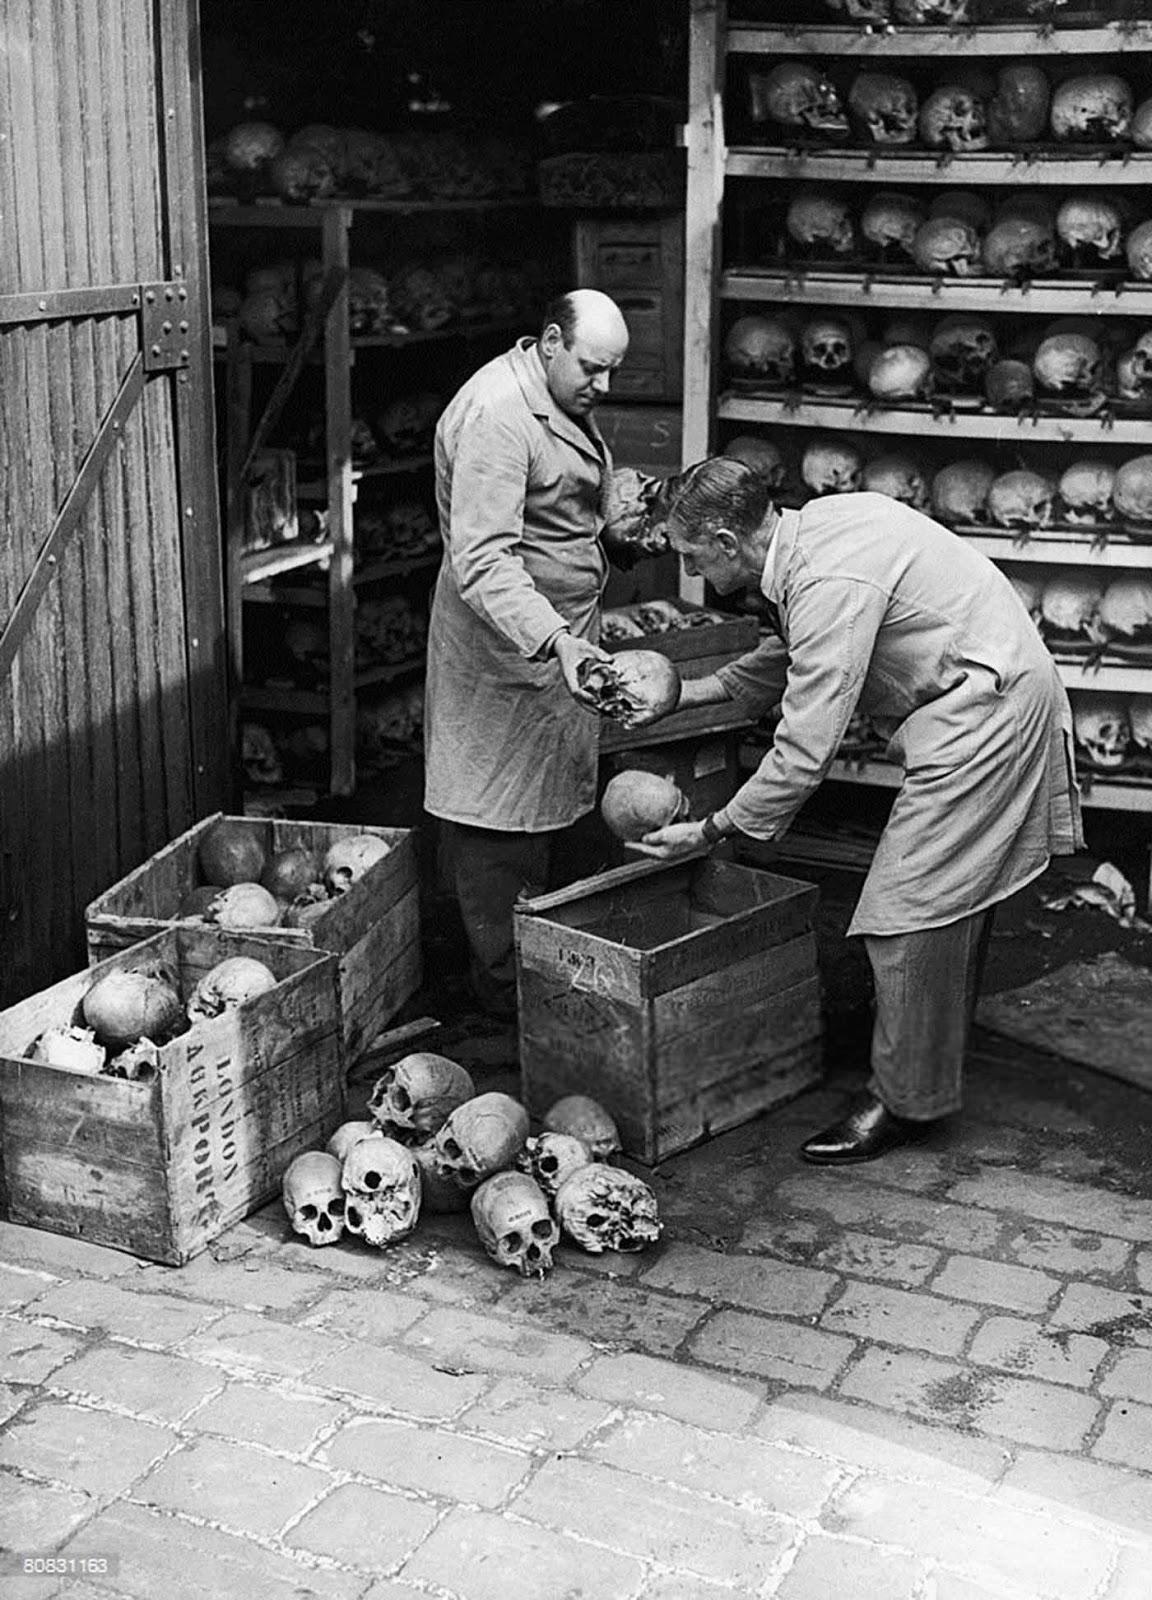 Unpacking human skulls, 1948.